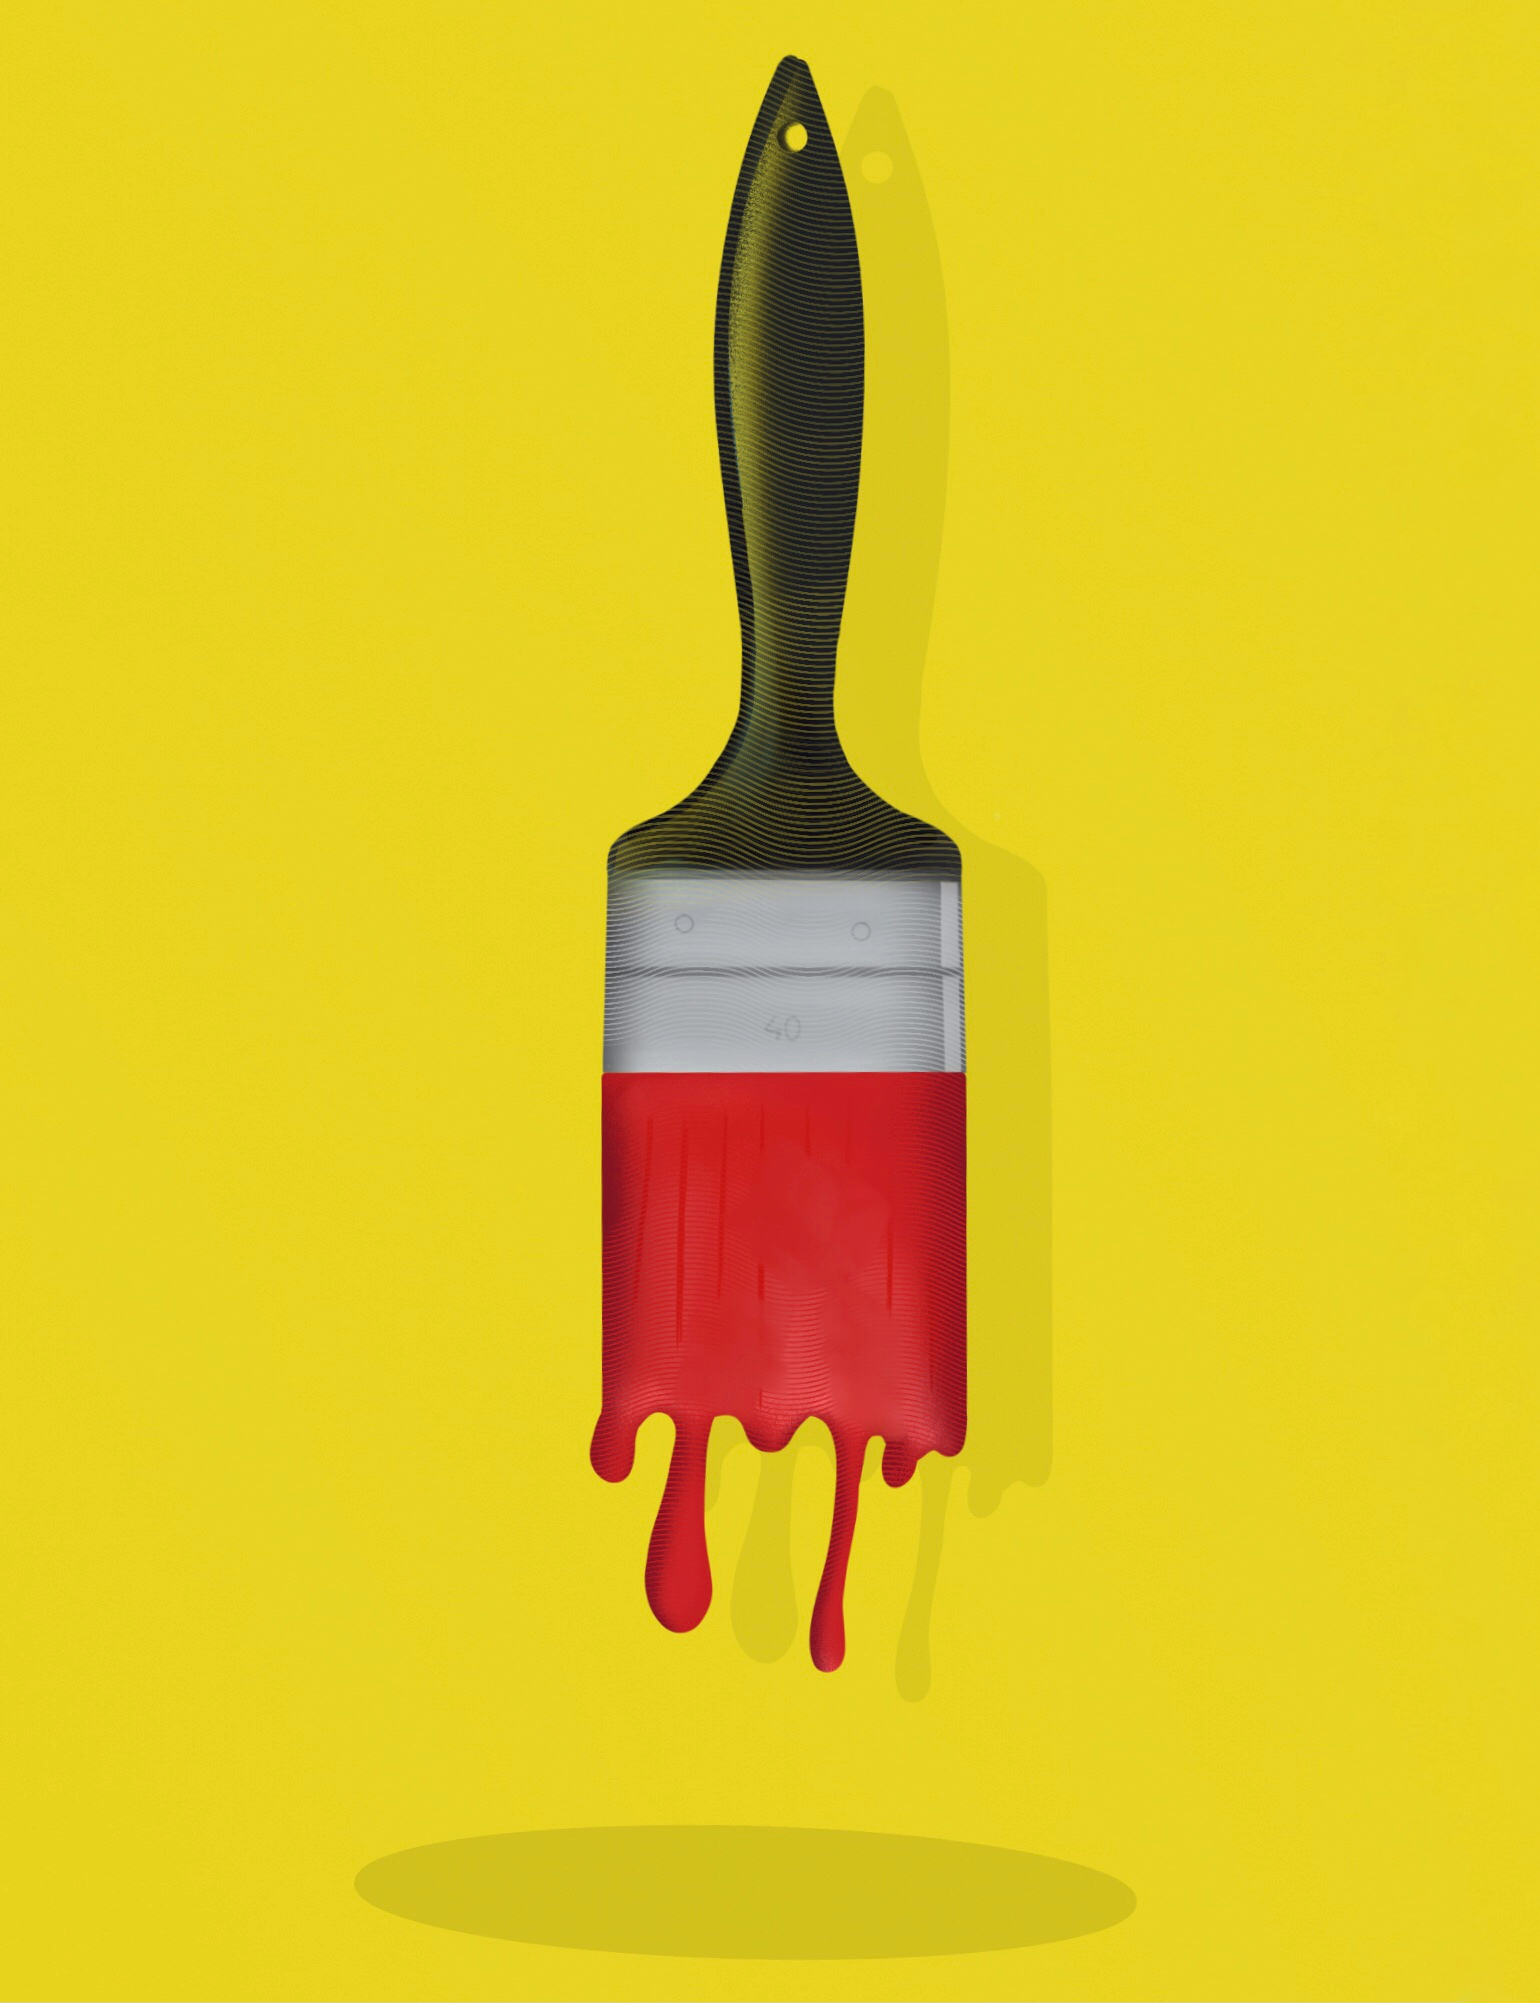 Paint brush illustration